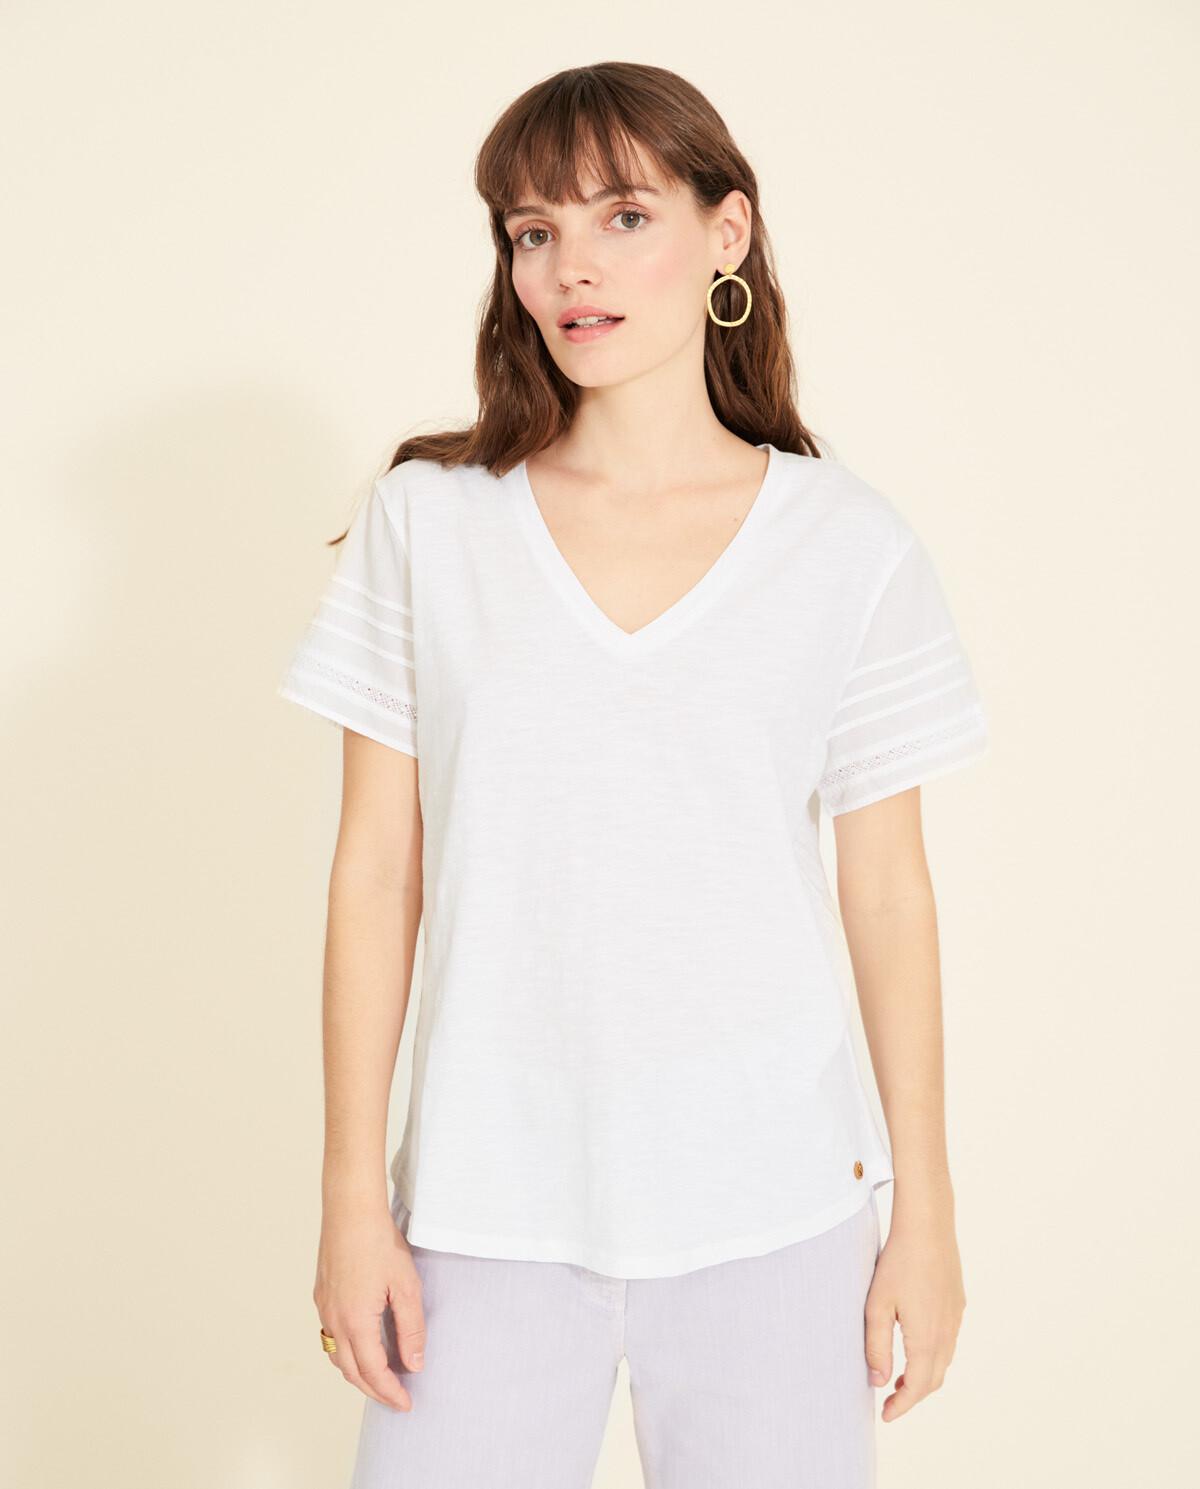 Belle White Tshirt 34021